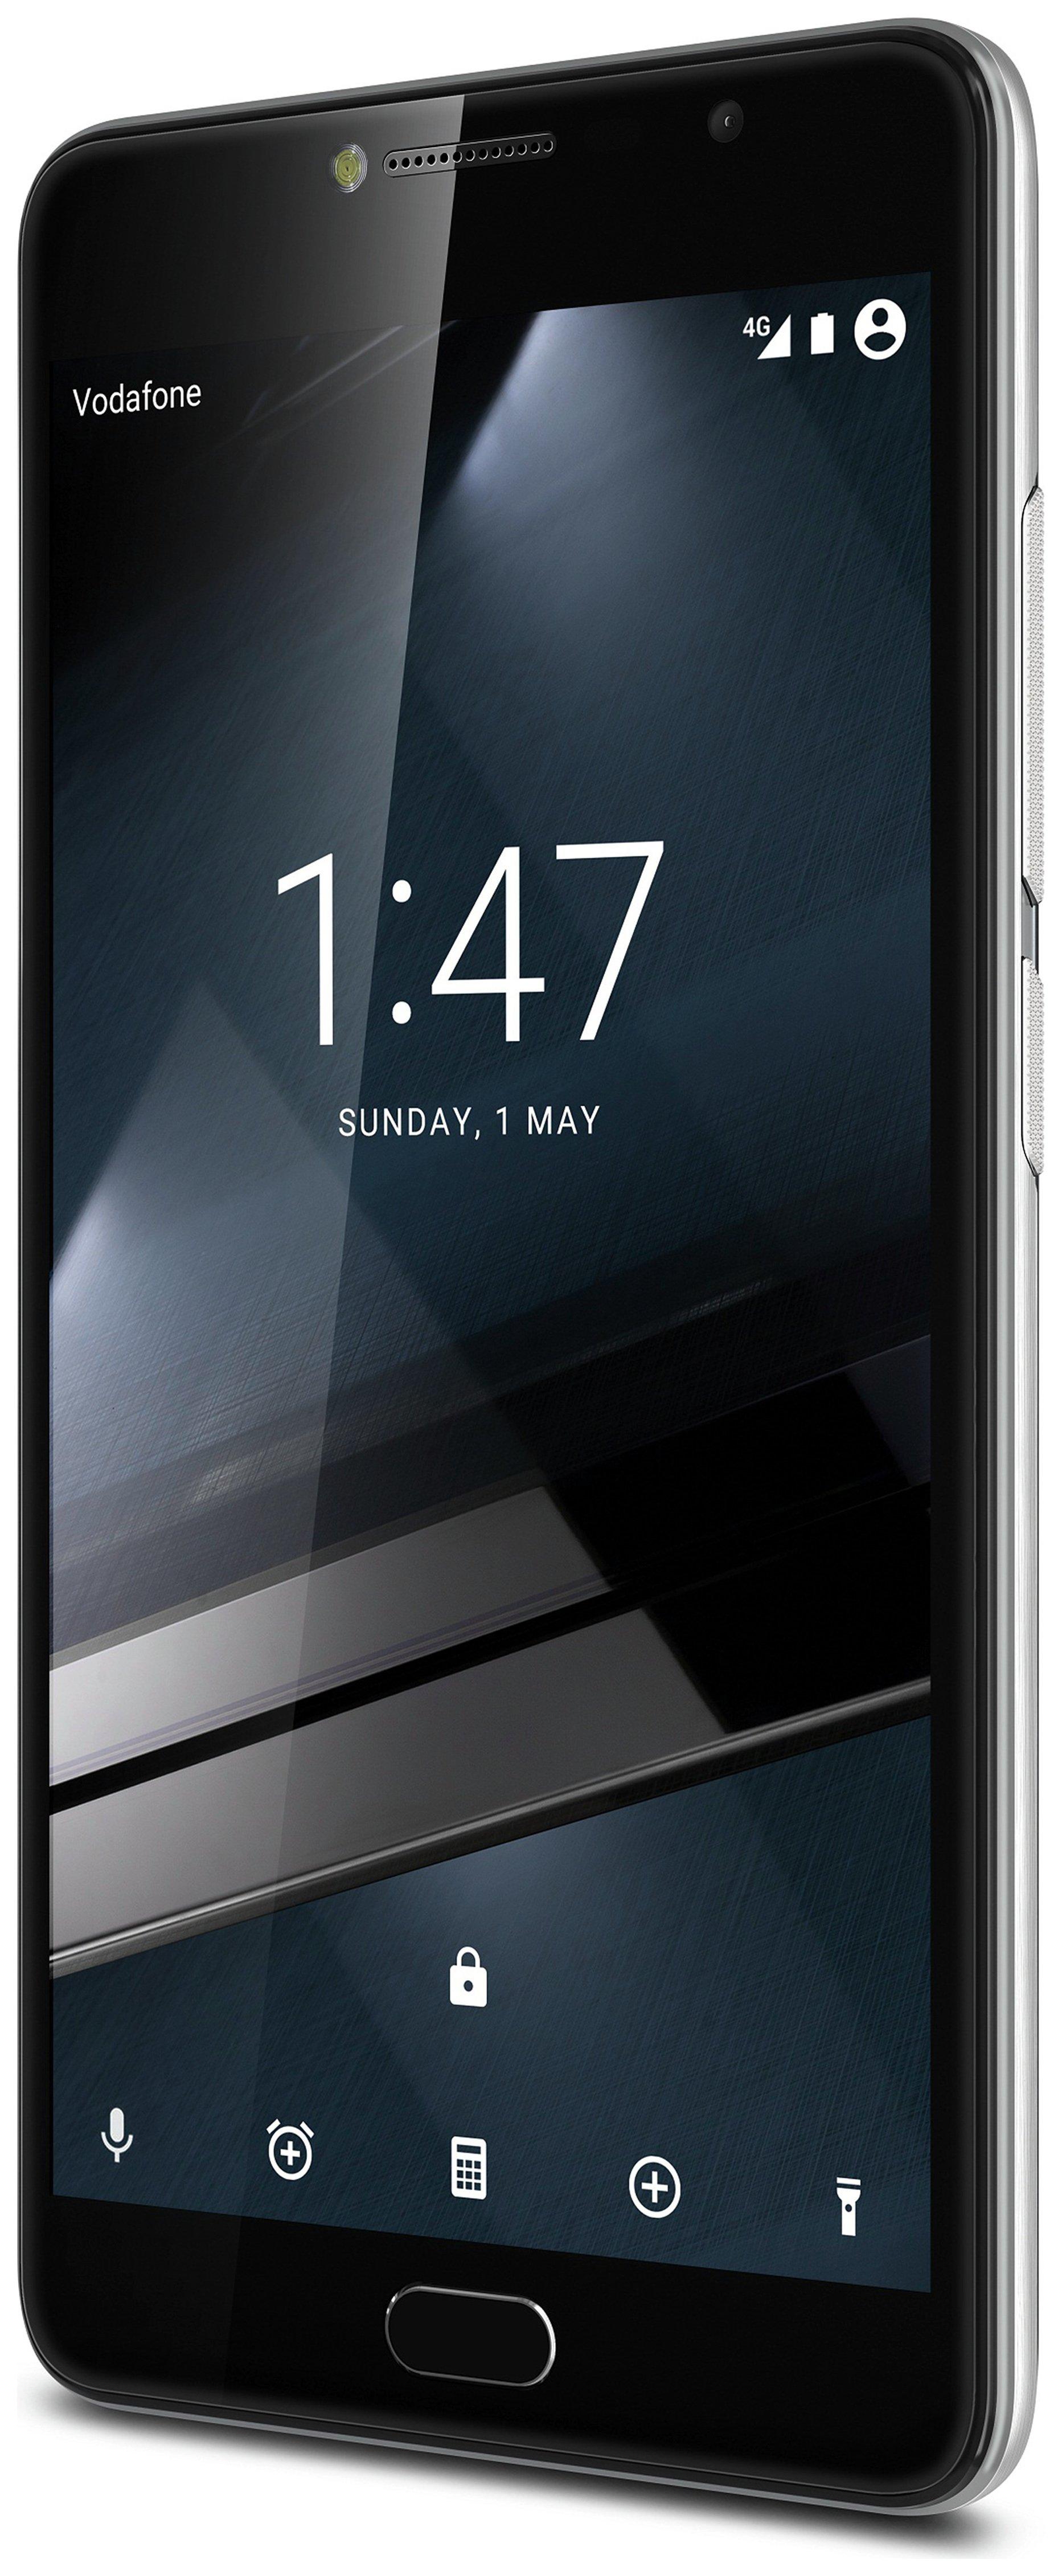 Vodafone Smart Ultra 7 Mobile Phone - Black.